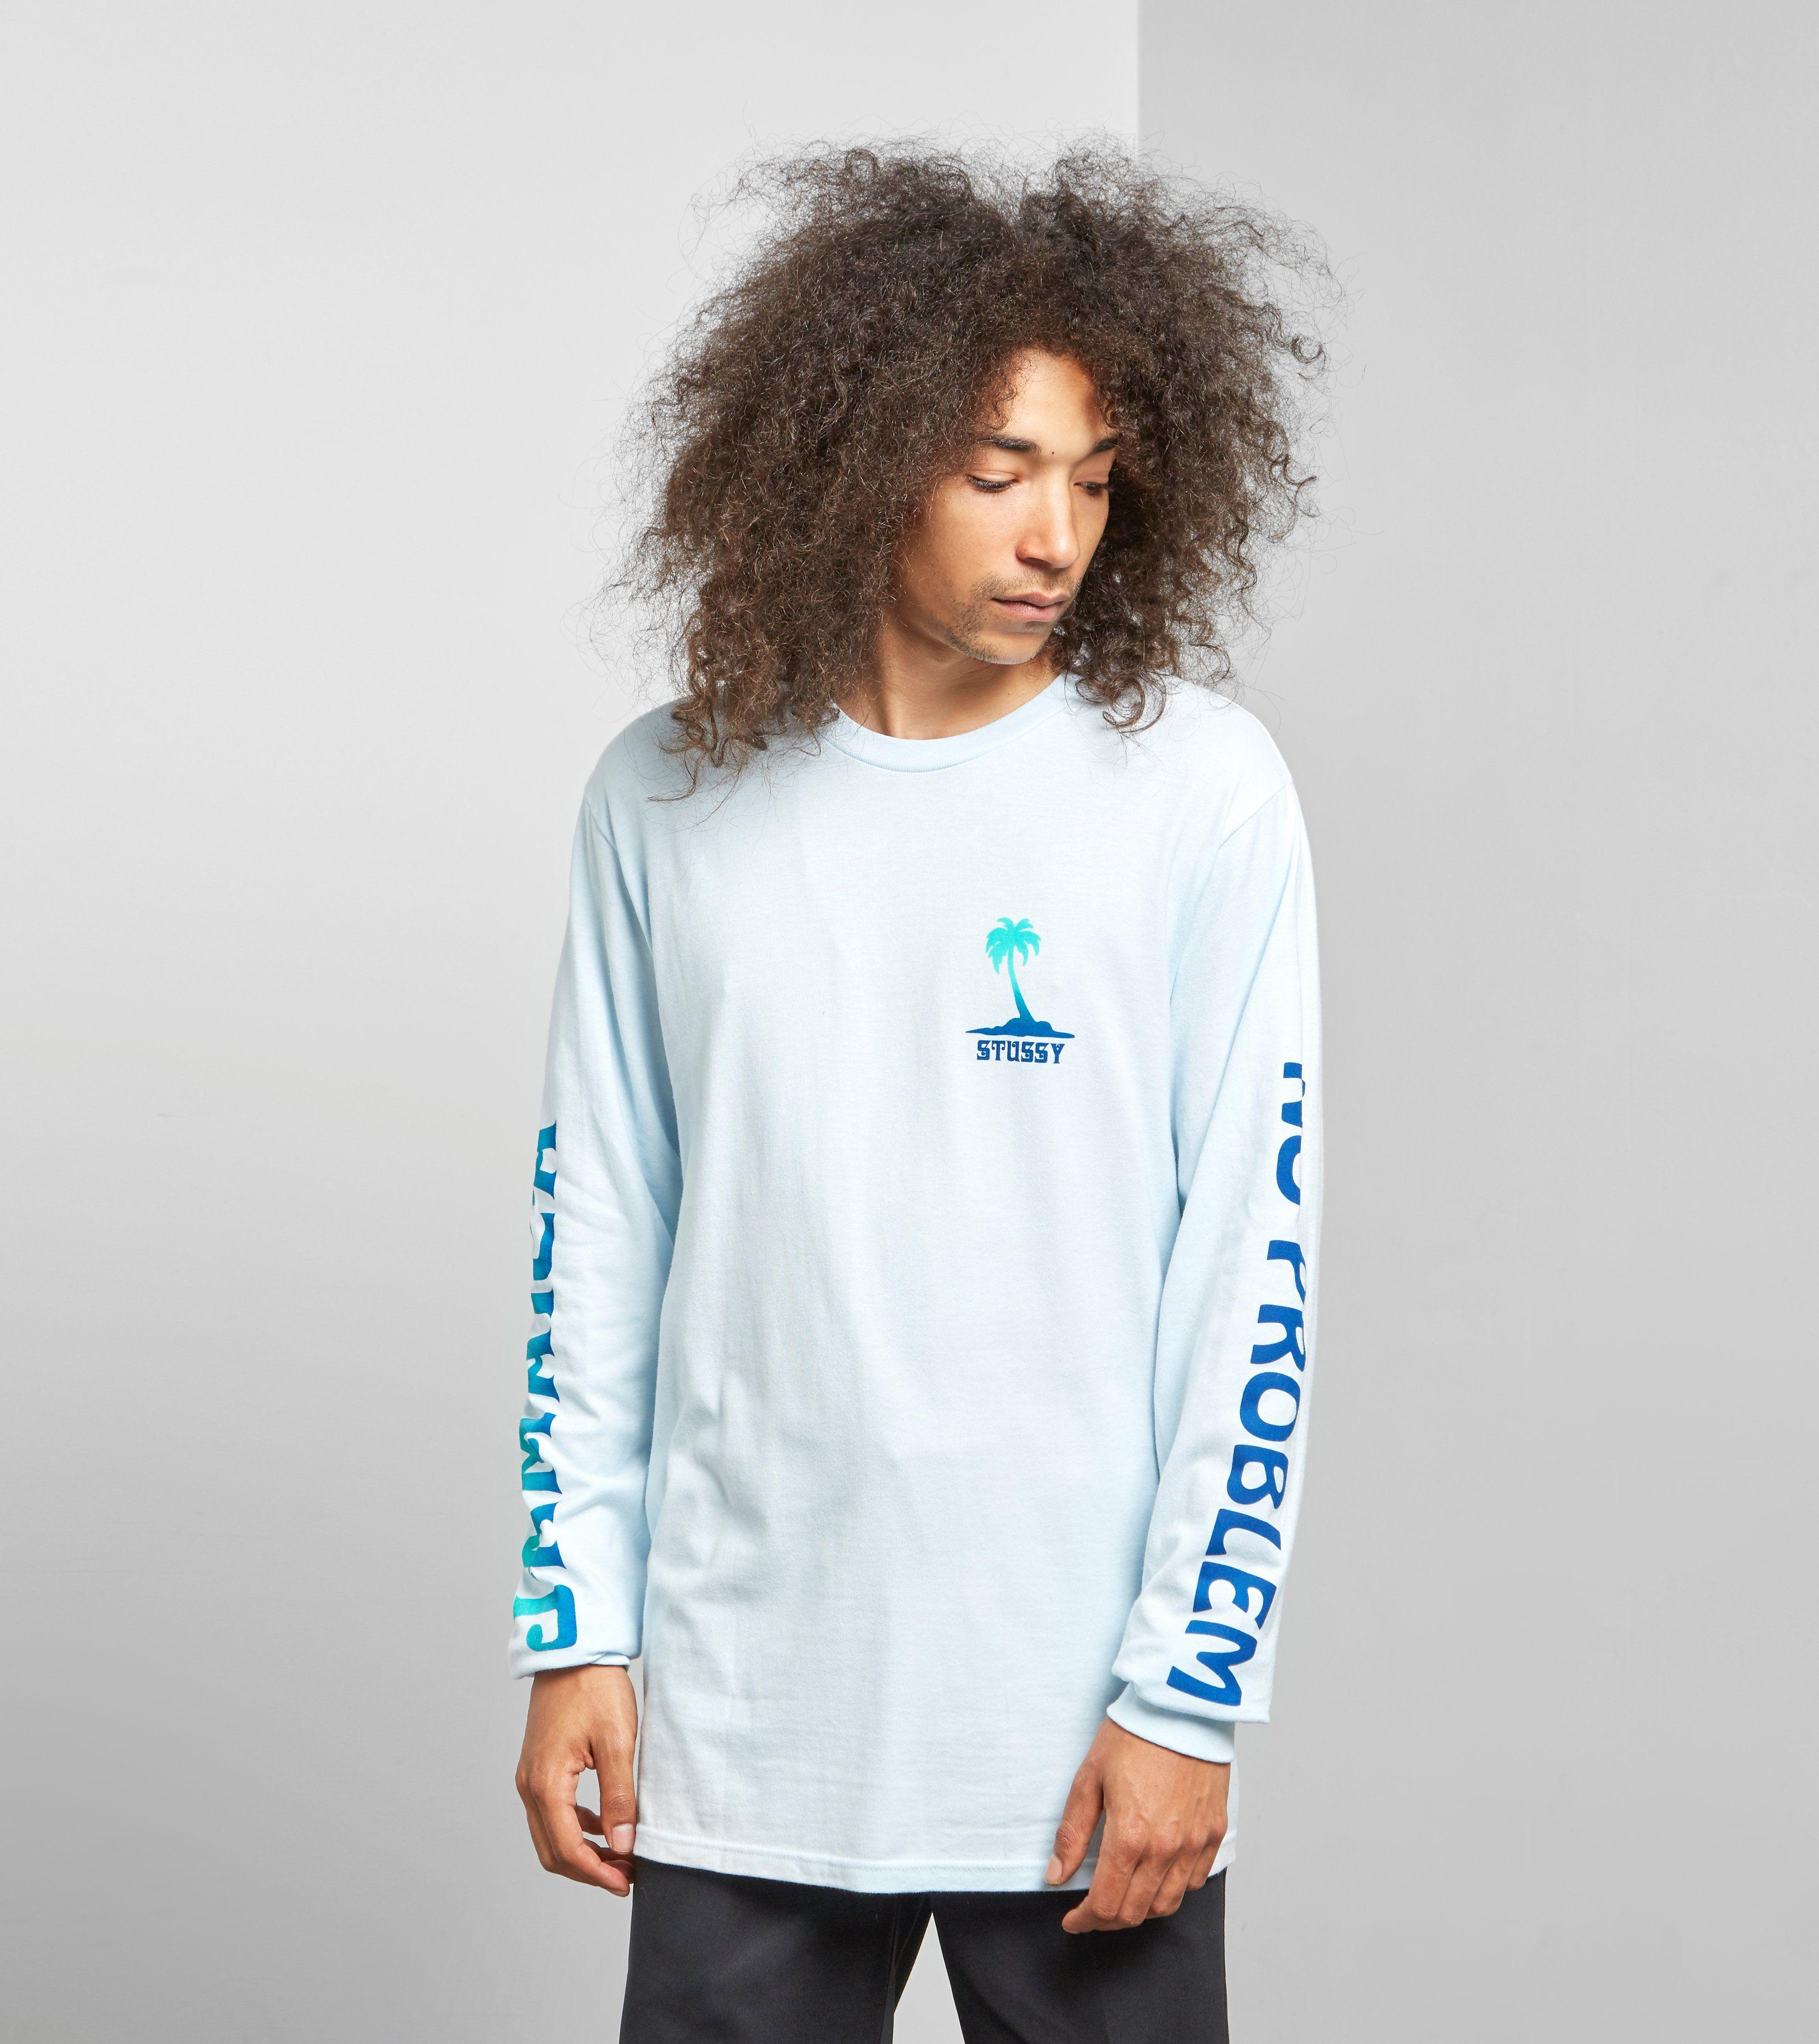 Stussy Jamaica Long Sleeved T-Shirt